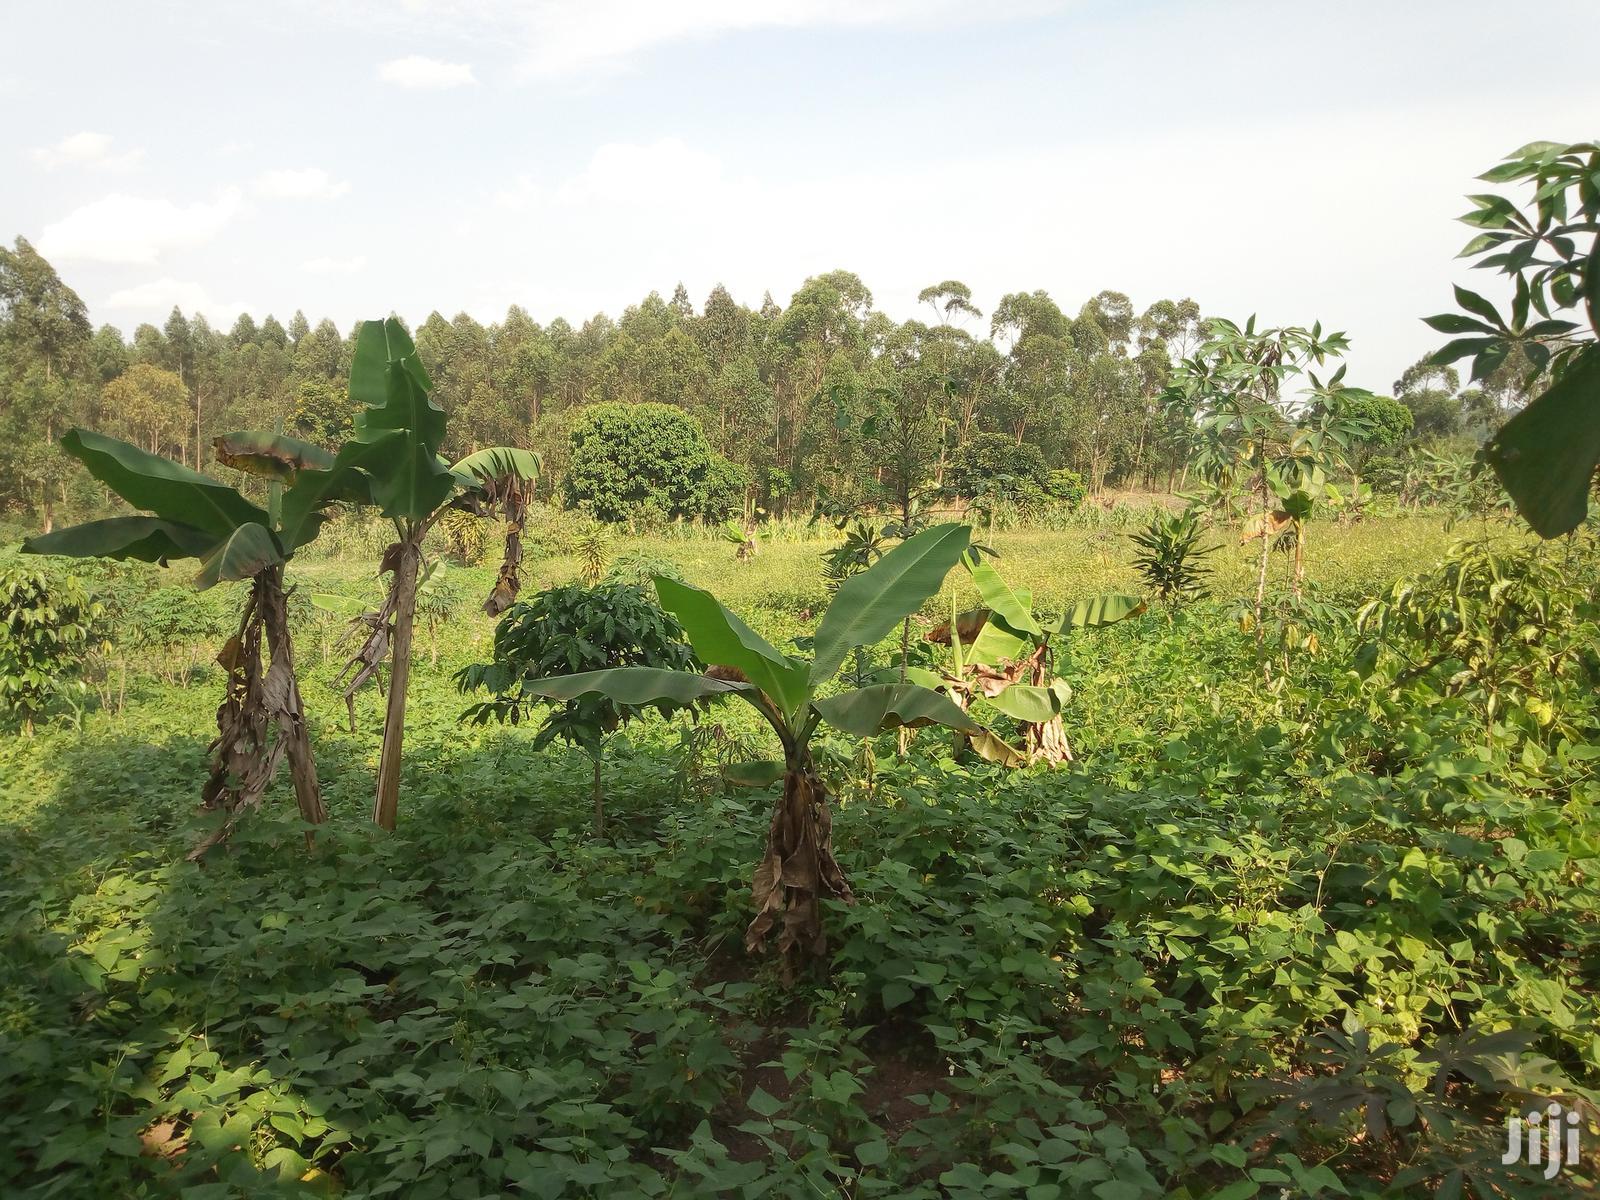 Plots and Large Land at Gobero Hoima Road for KATS DEO SURVEYS LTD | Land & Plots For Sale for sale in Wakiso, Central Region, Uganda